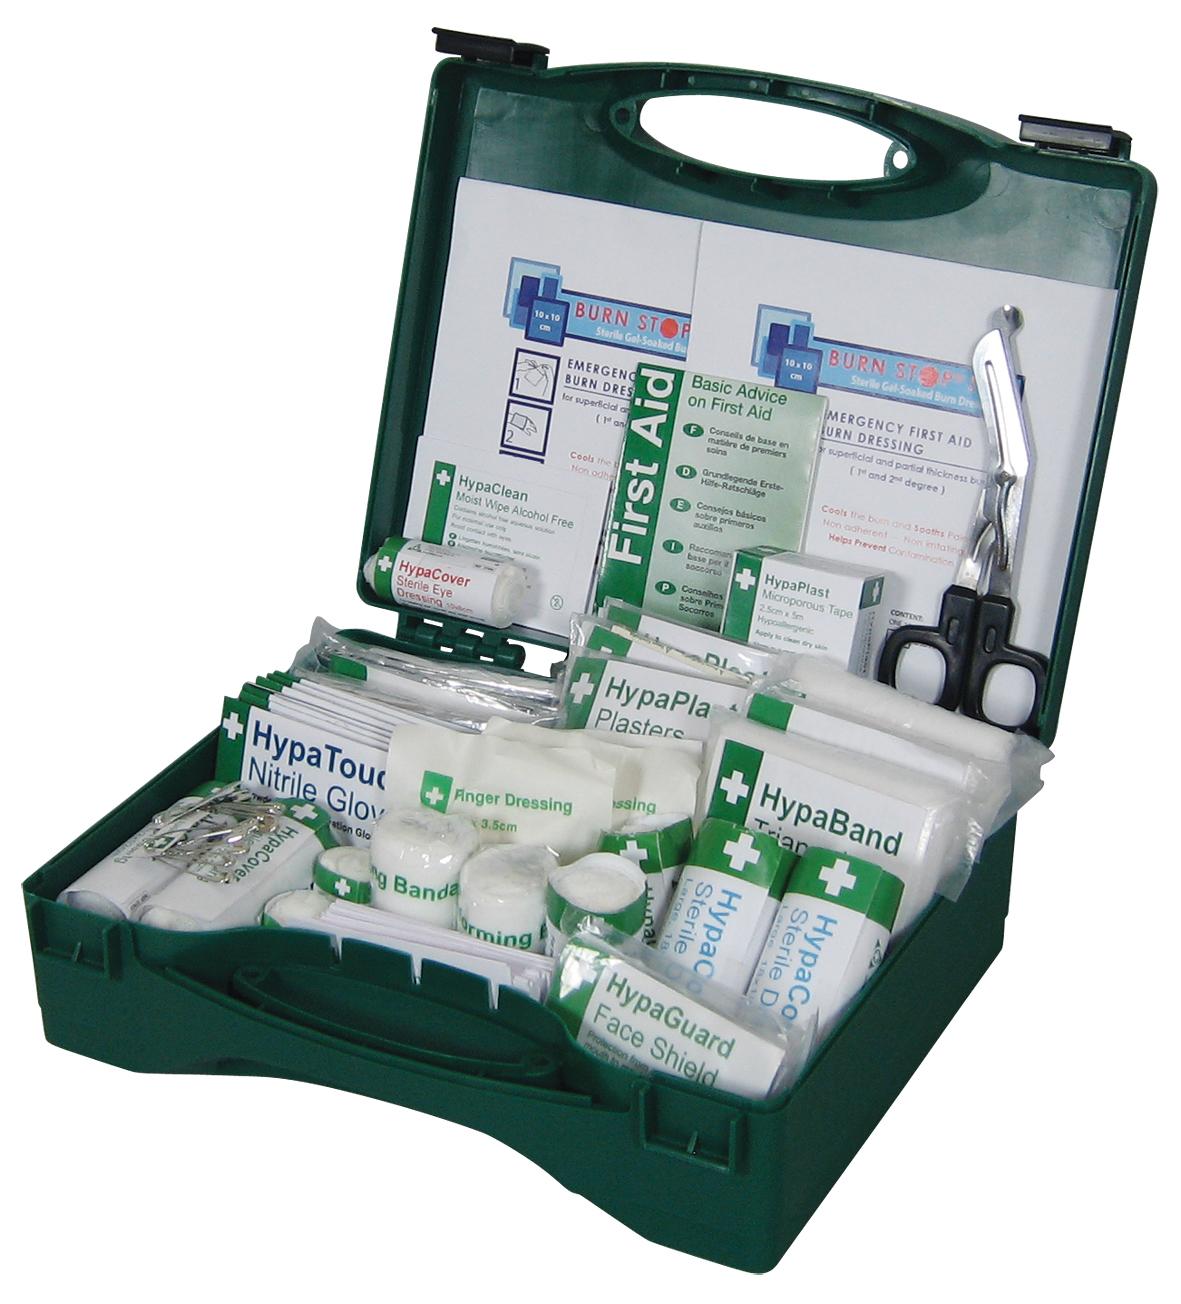 First aid kits east london university